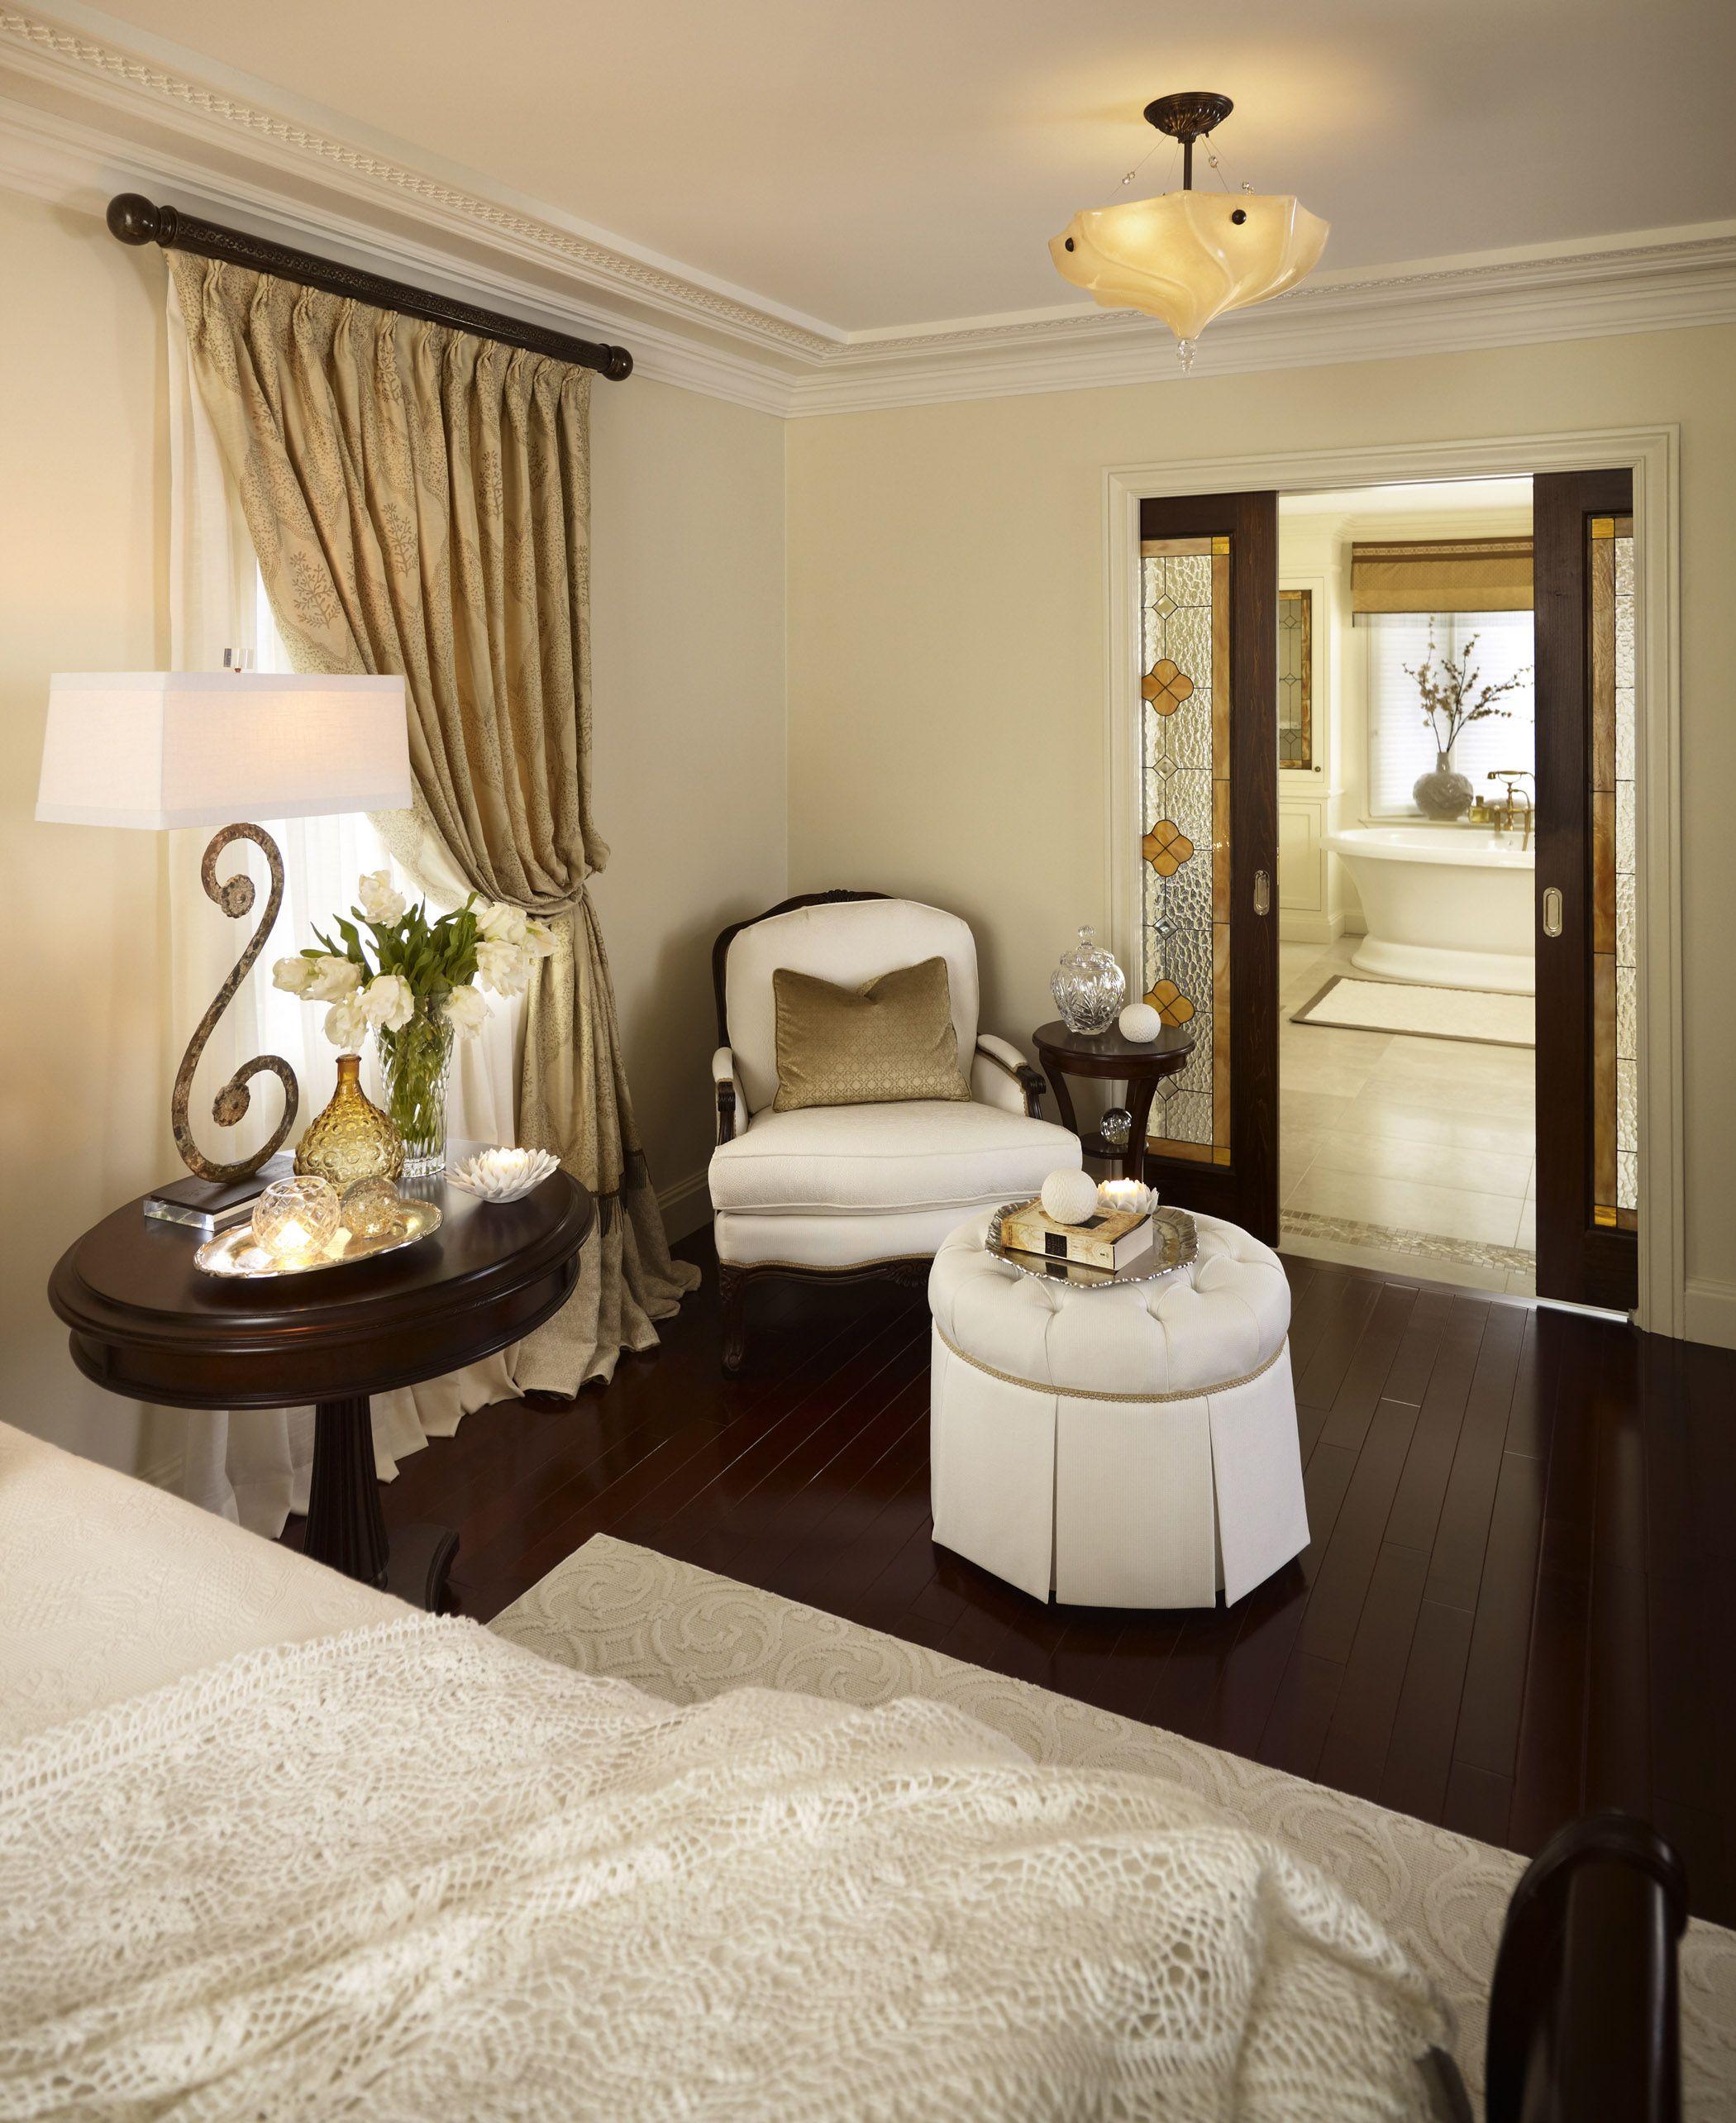 3 Kind Of Elegant Bedroom Design Ideas Includes A: Burlington Interior Design Project: Couple's Retreat